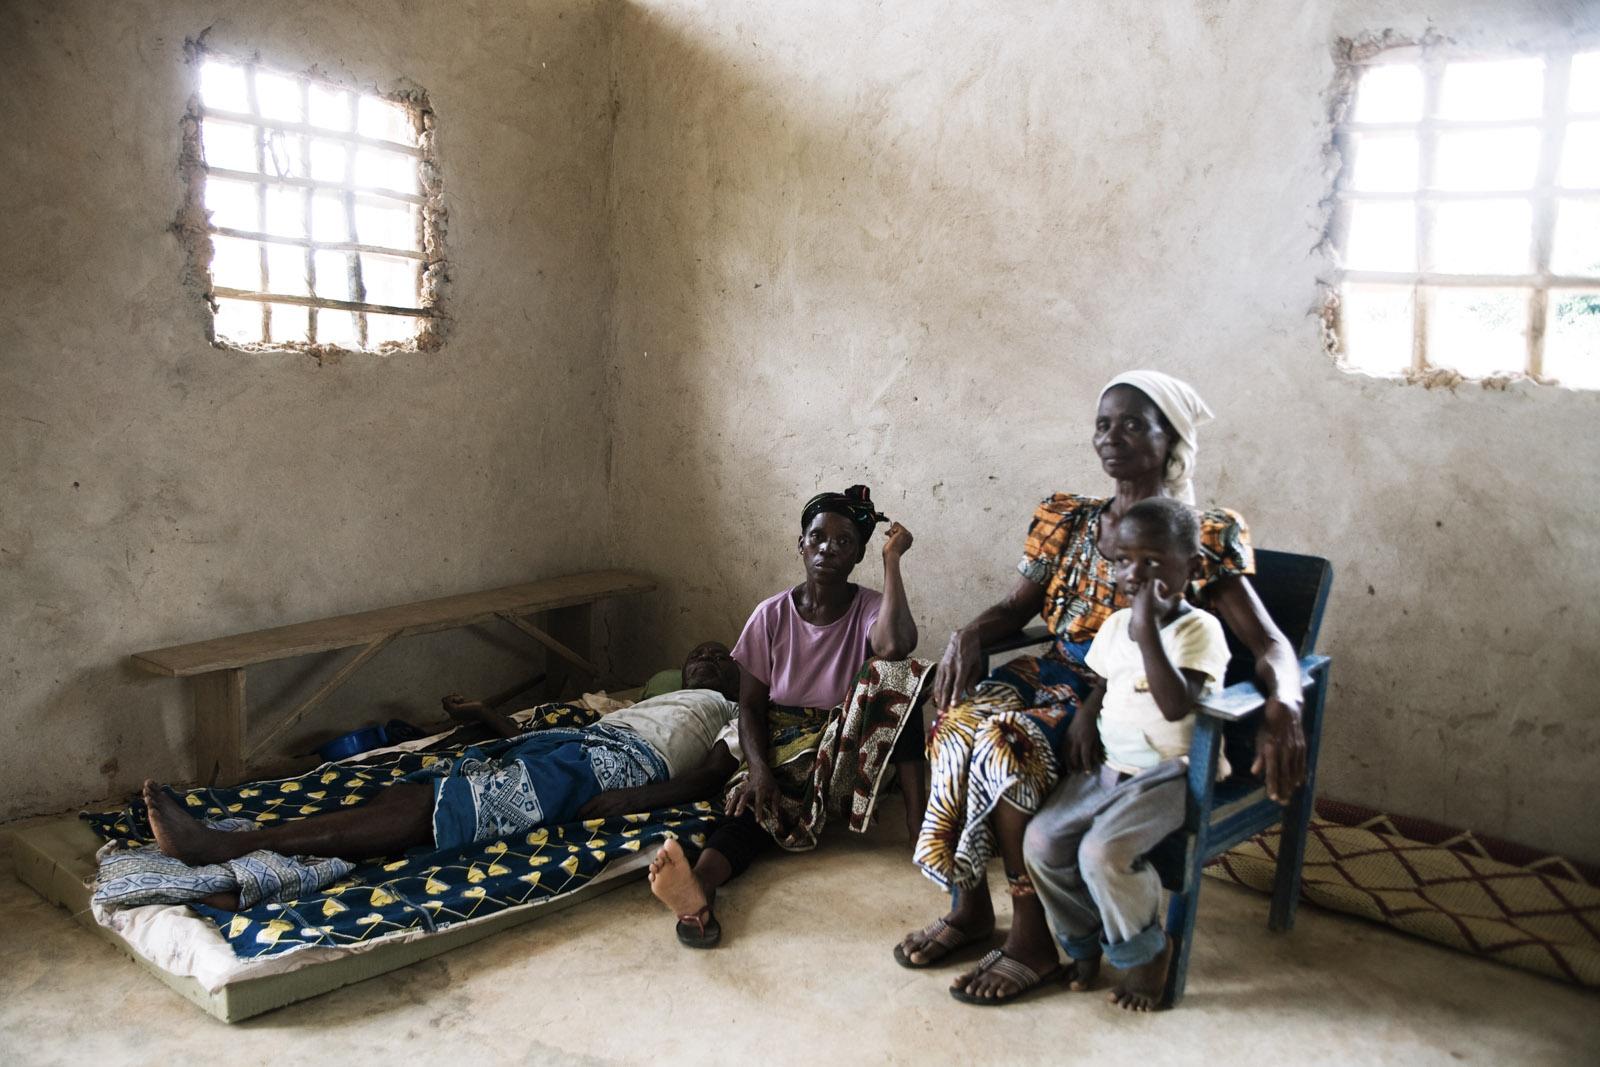 liberia-refugies-ivoiriens-0311-0622hd